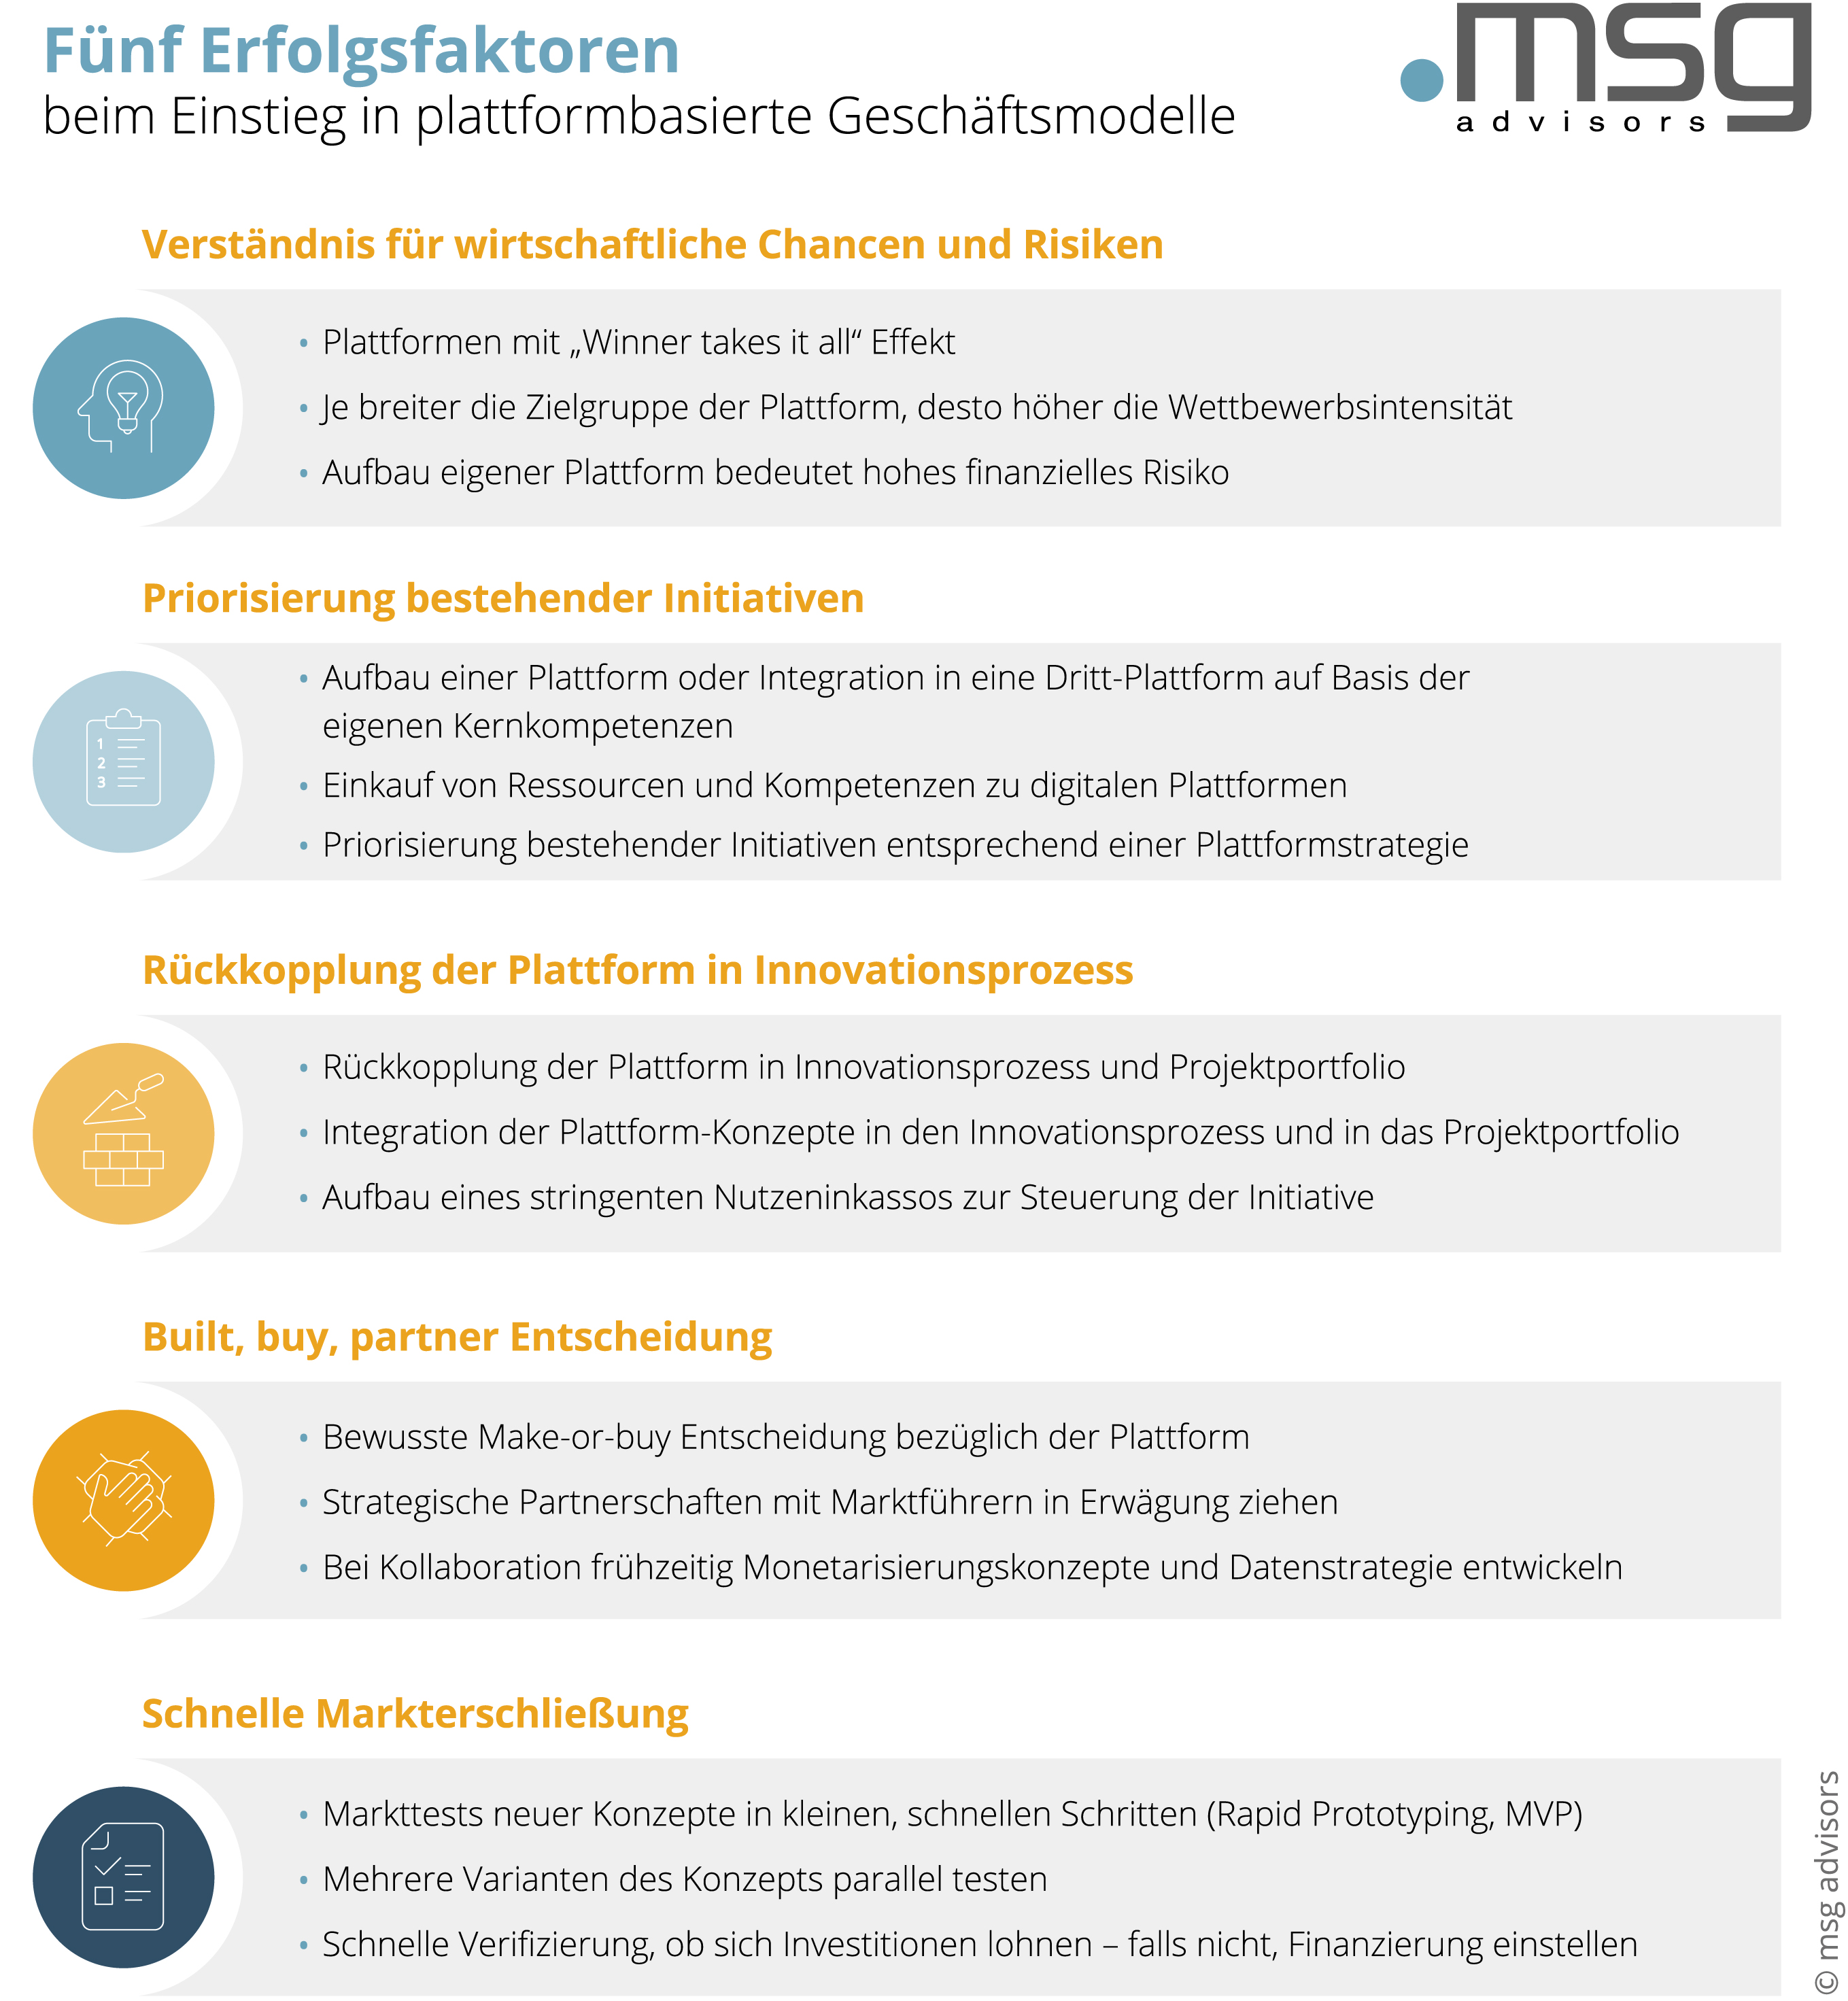 20200505_mad_Grafiken_Platform-Growth_DE02.jpg